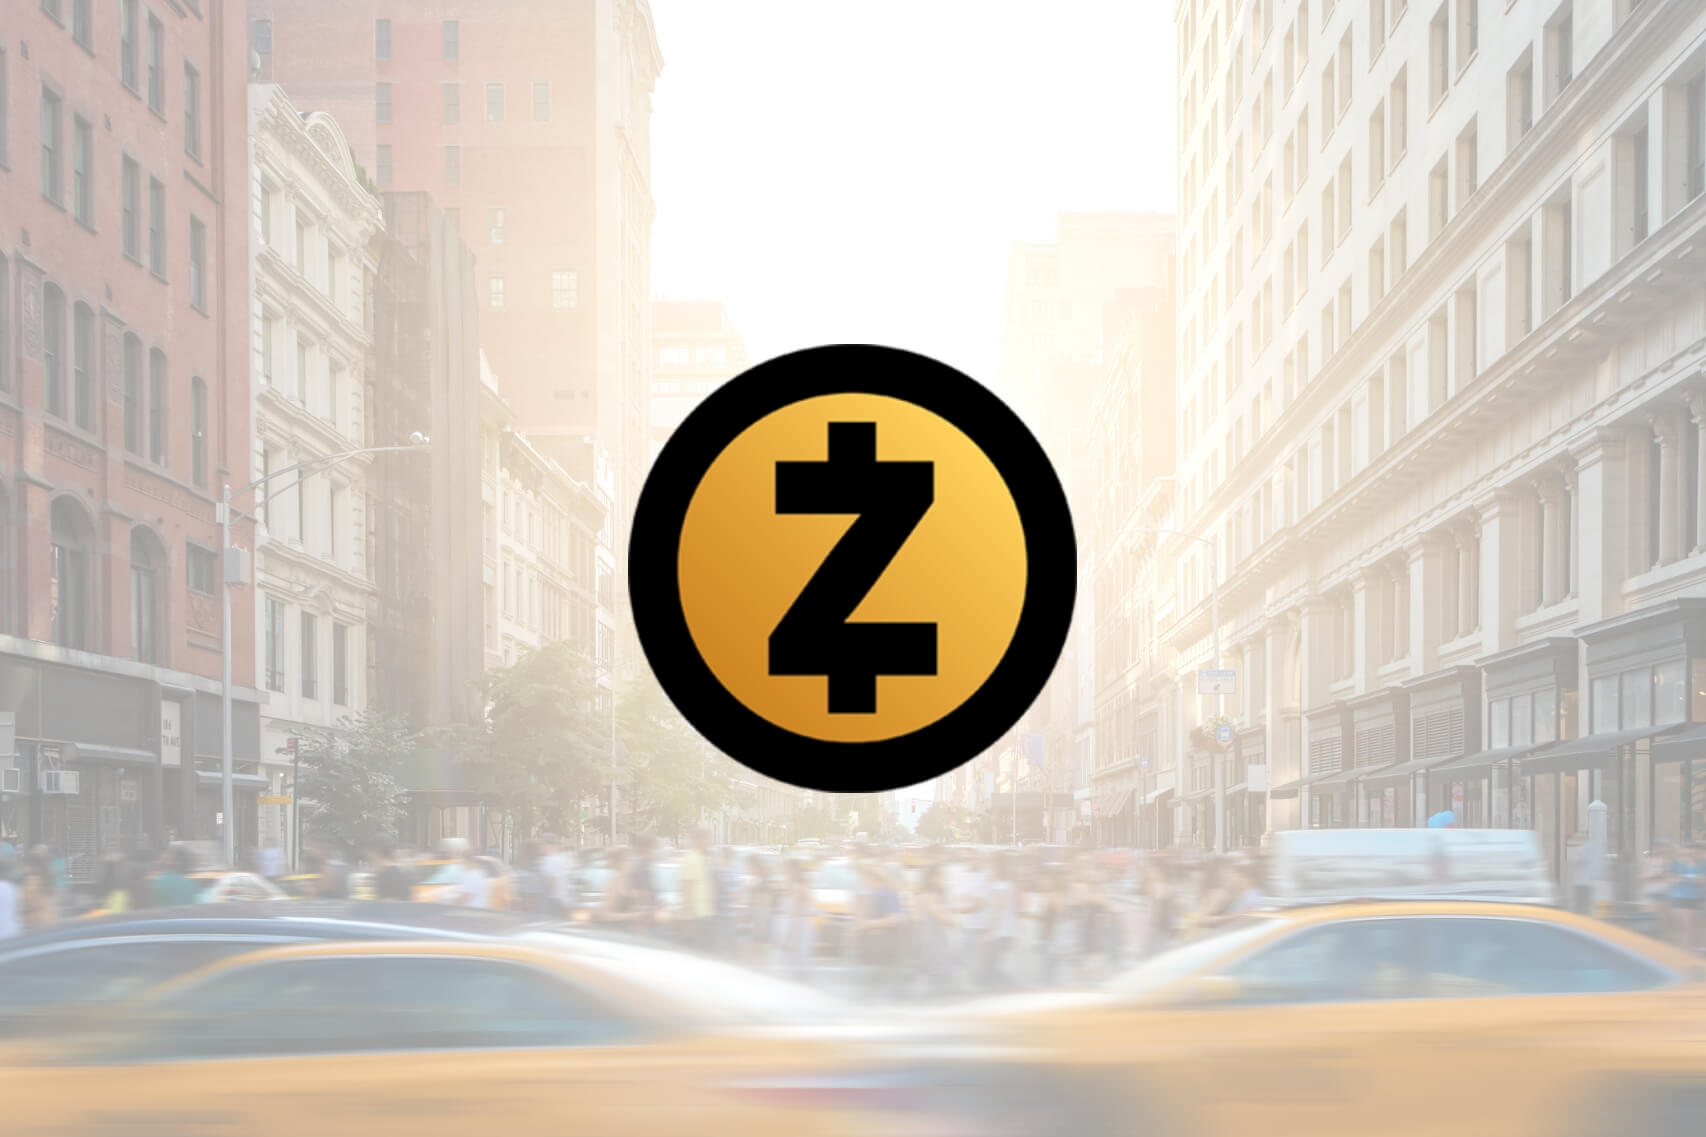 ZEC Price Analysis